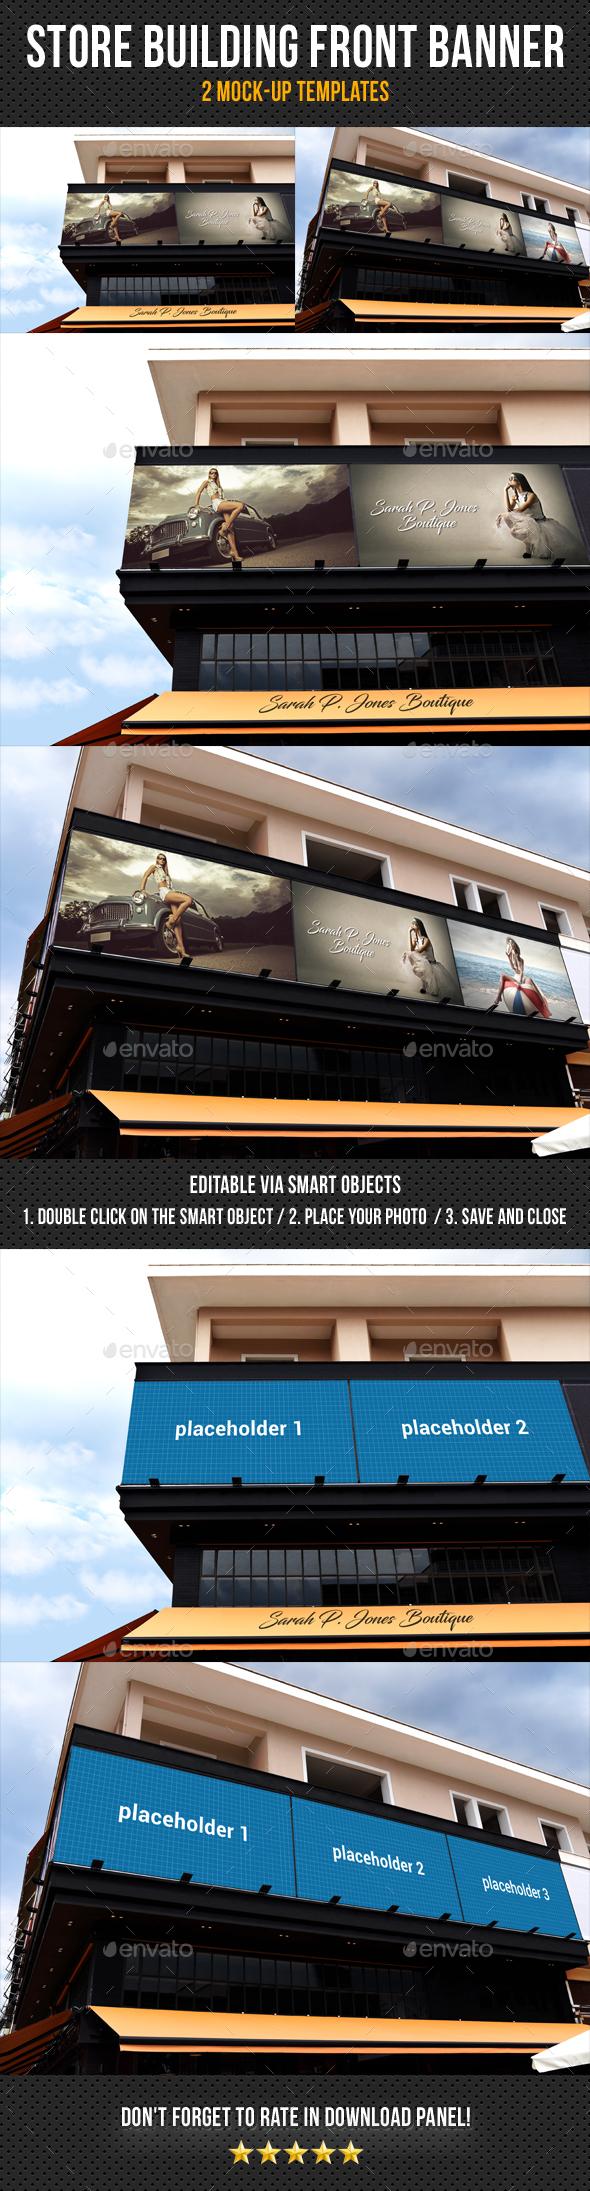 Store Building Front Banner Mock-Up Pack - Signage Print